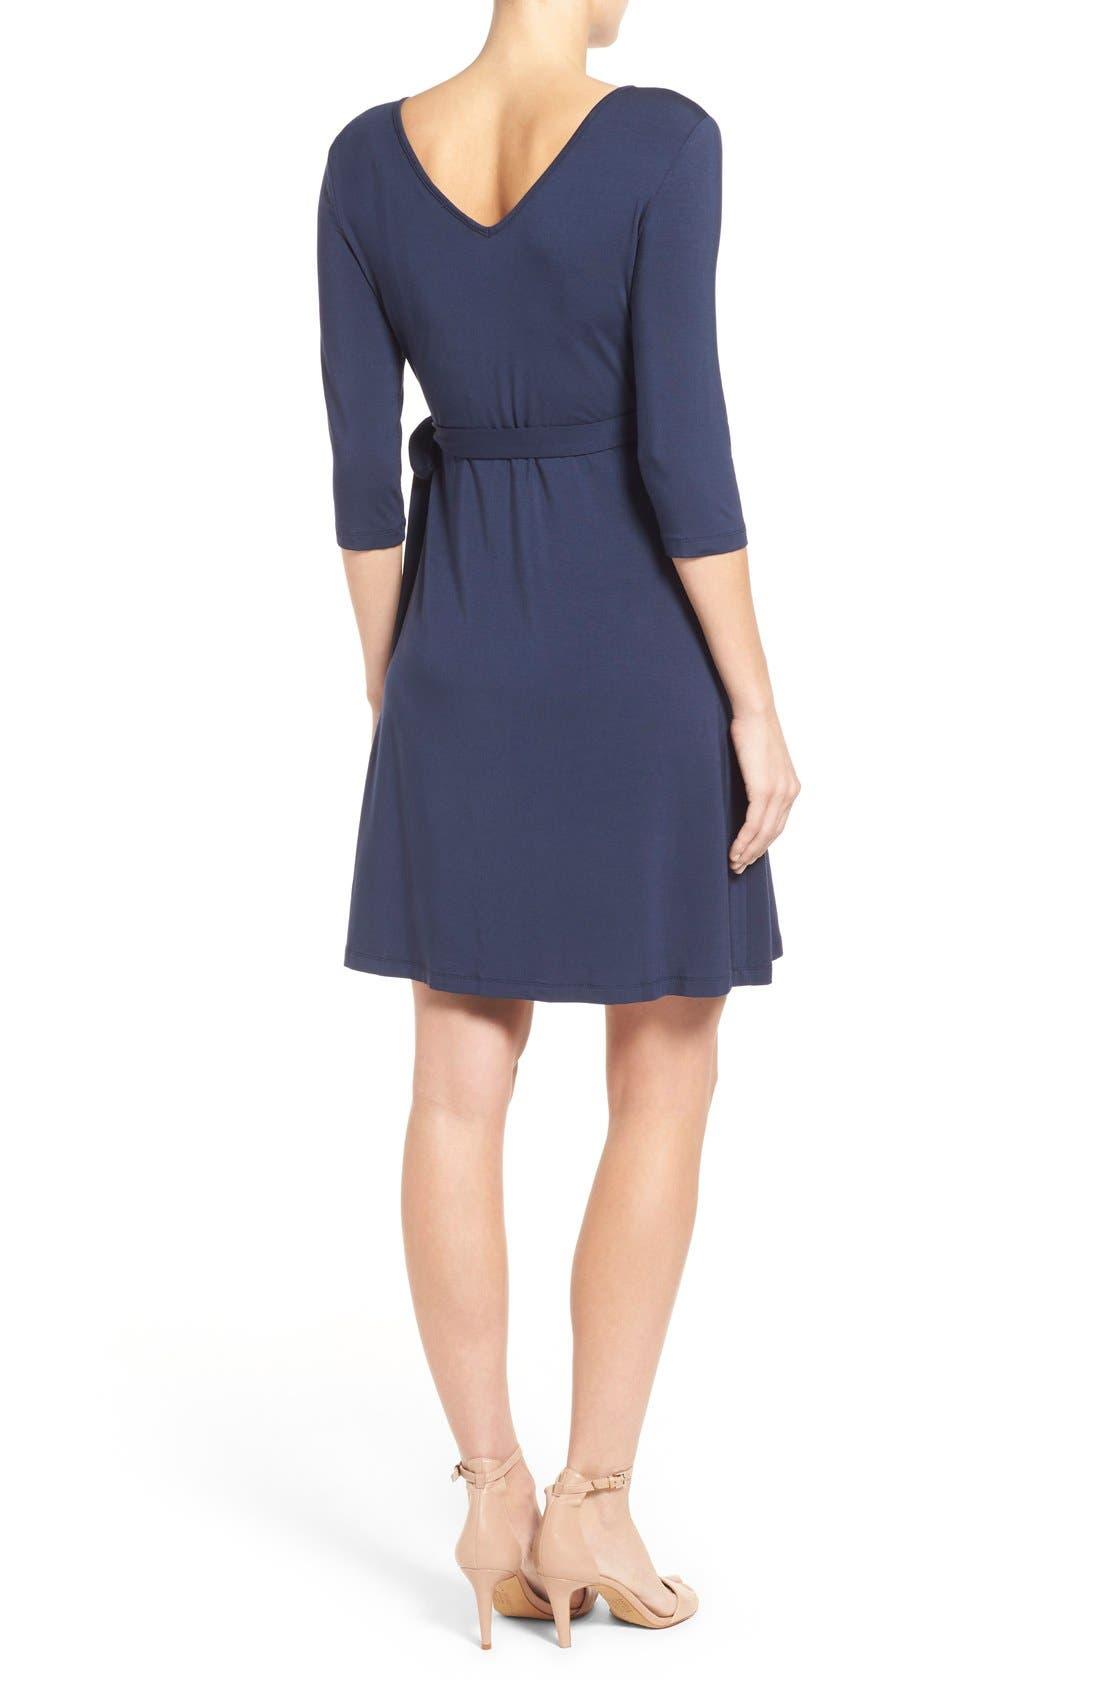 'Rhiannon' Turtleneck Fit & Flare Maternity Dress,                             Alternate thumbnail 2, color,                             Peacoat